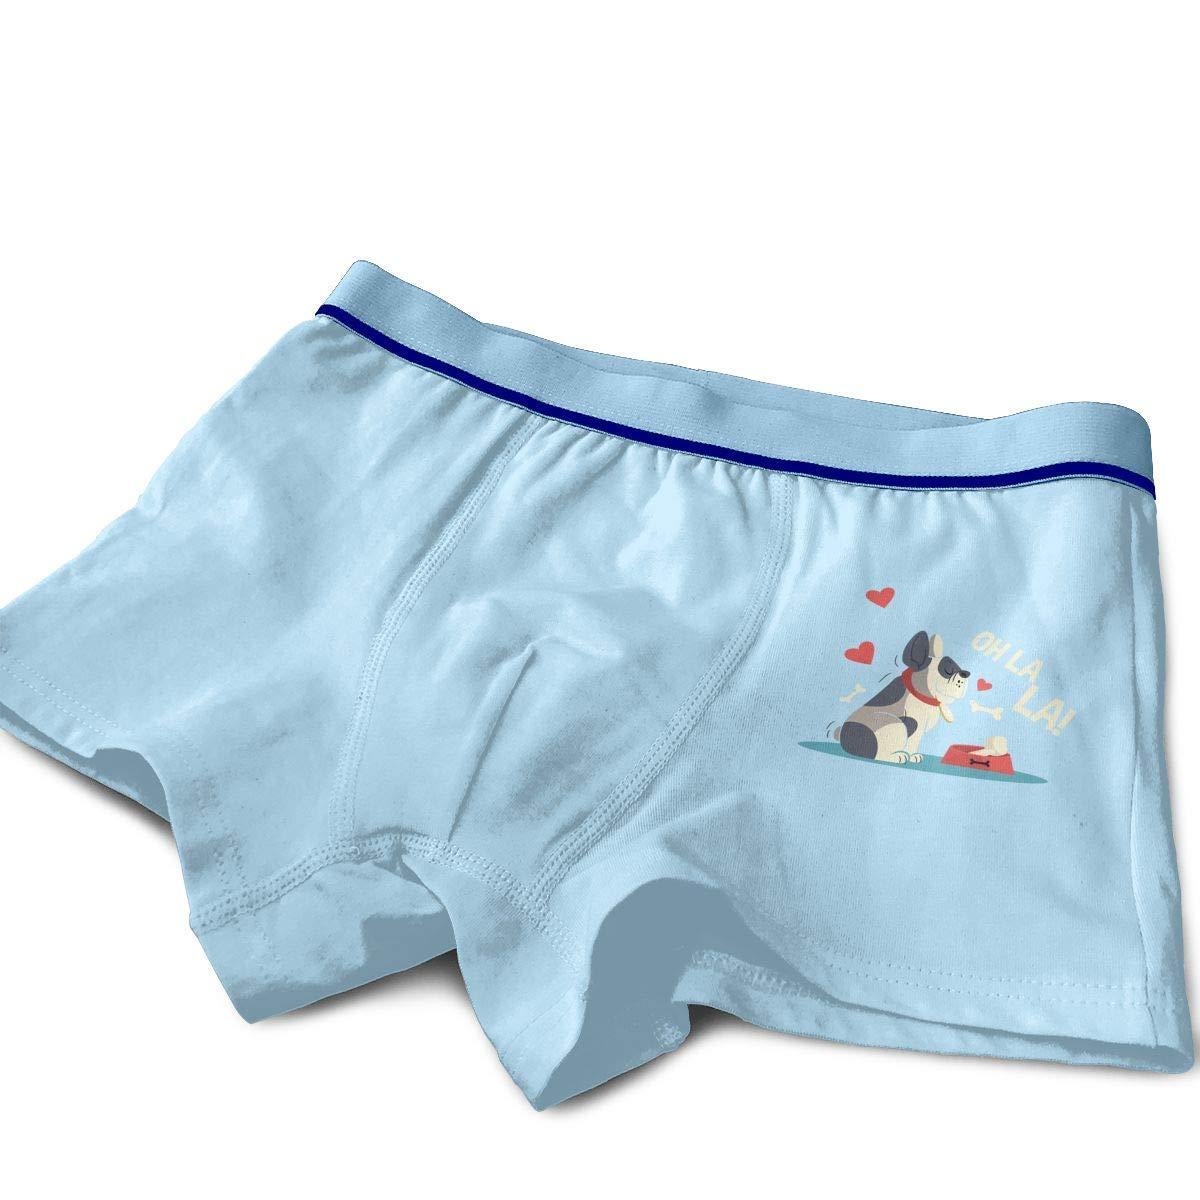 c70ce64df Get Quotations · Neikuqsn Pitbull Teen Solid Color Cotton Tagless Underwear  Boxer Panties